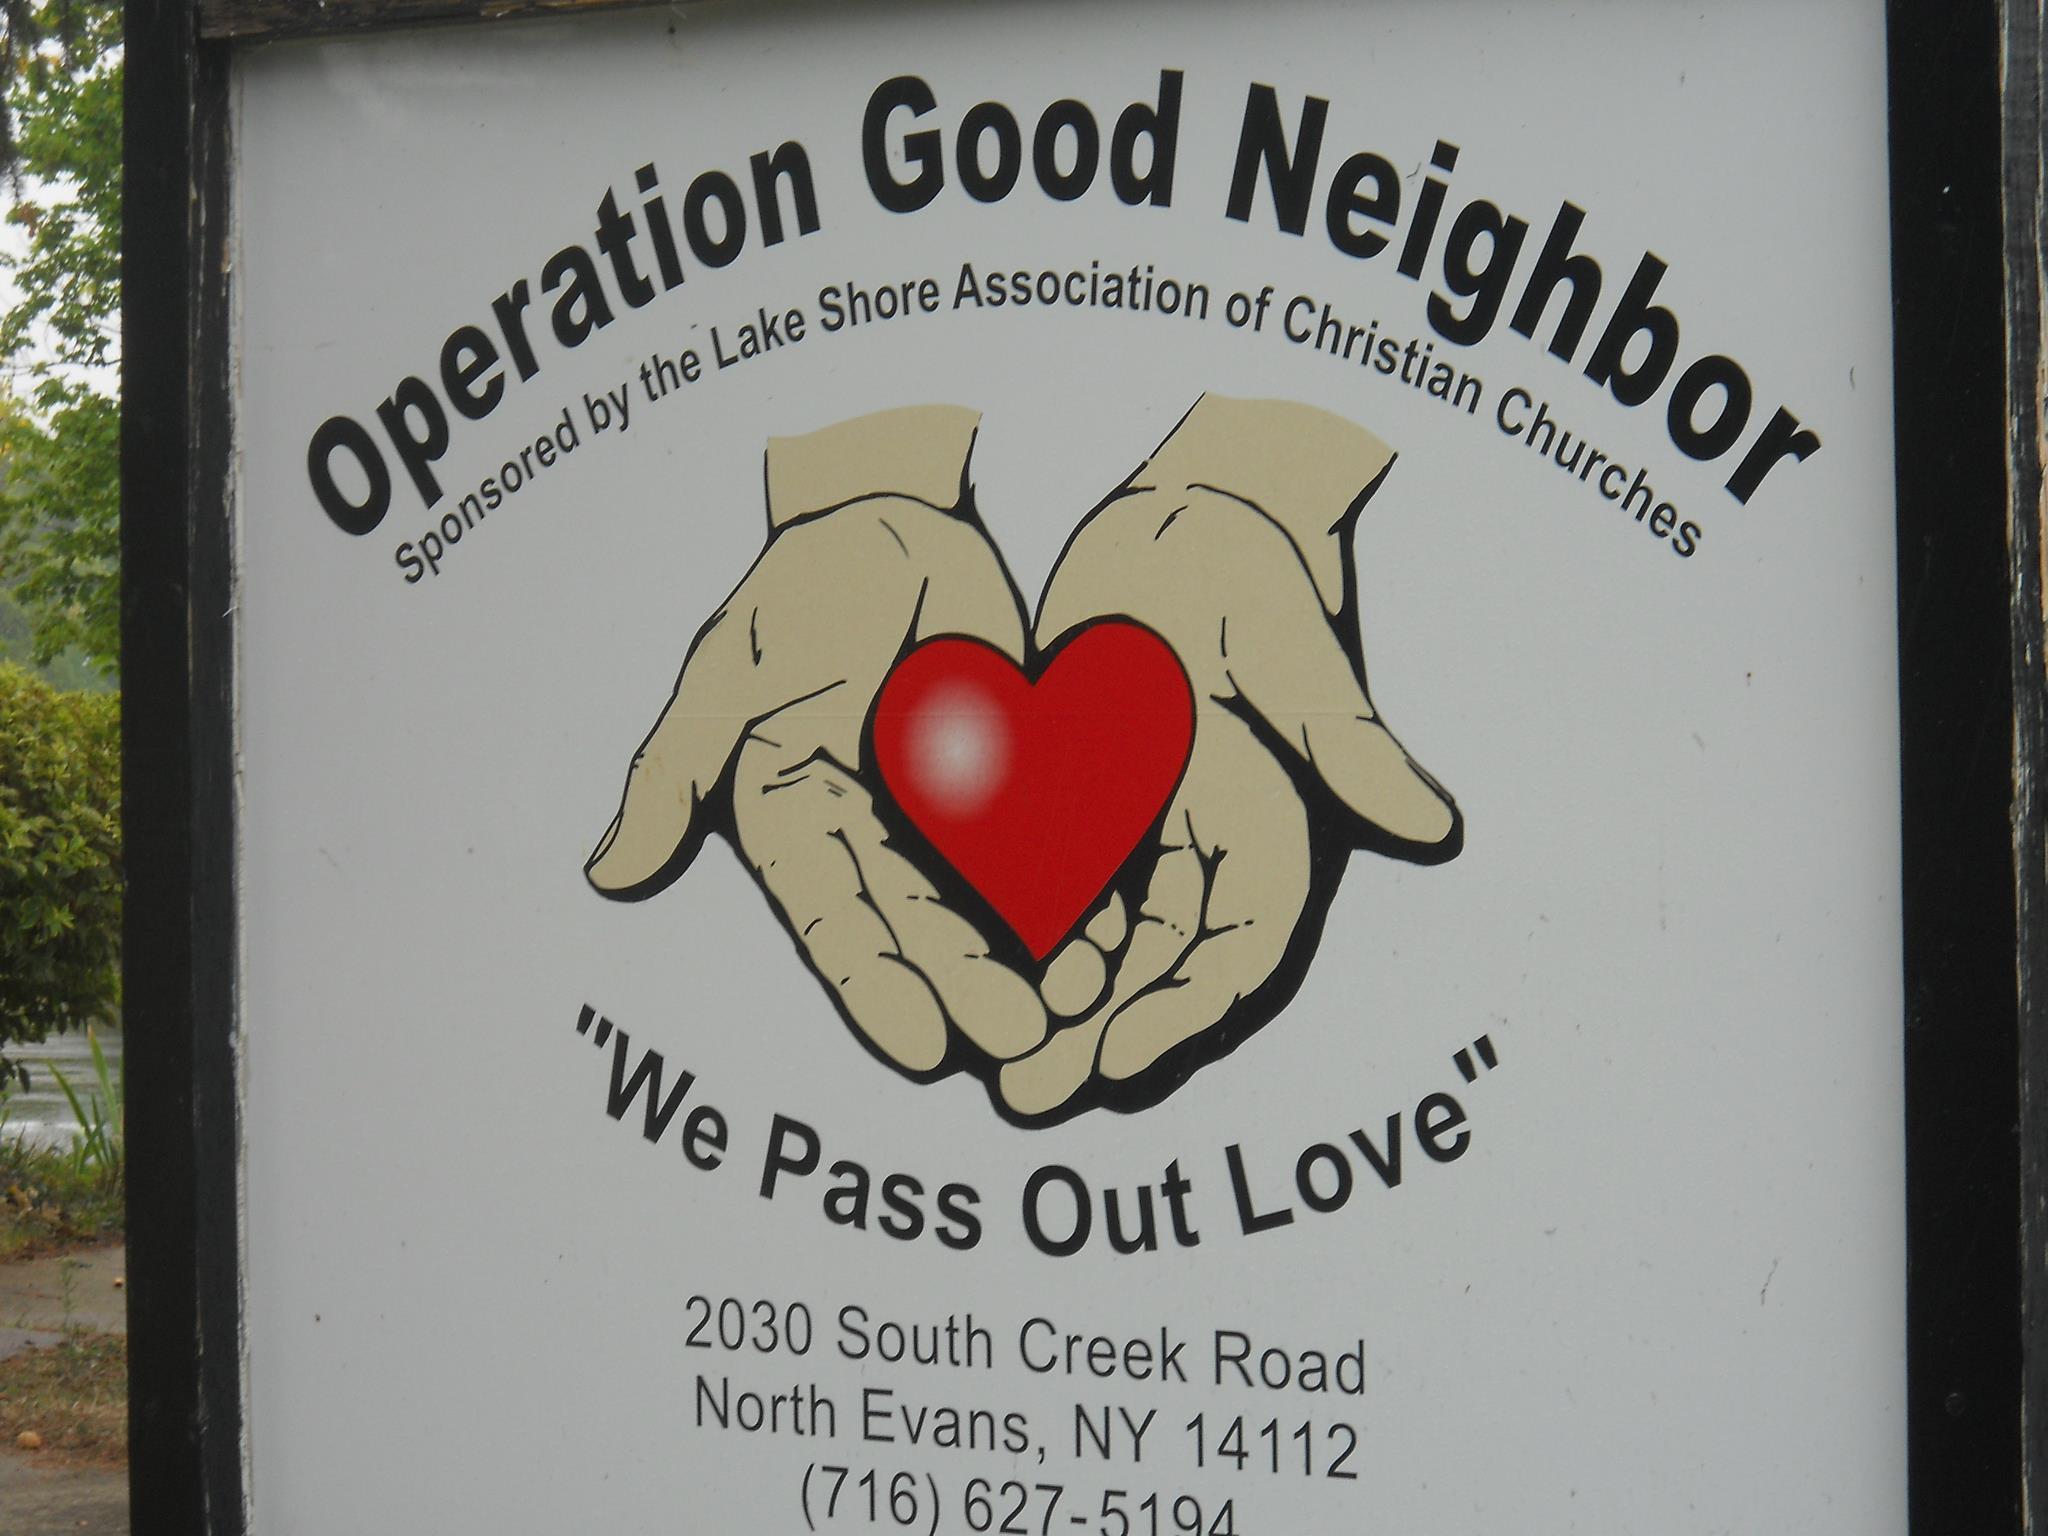 Operation Good Neighbor Food Pantry